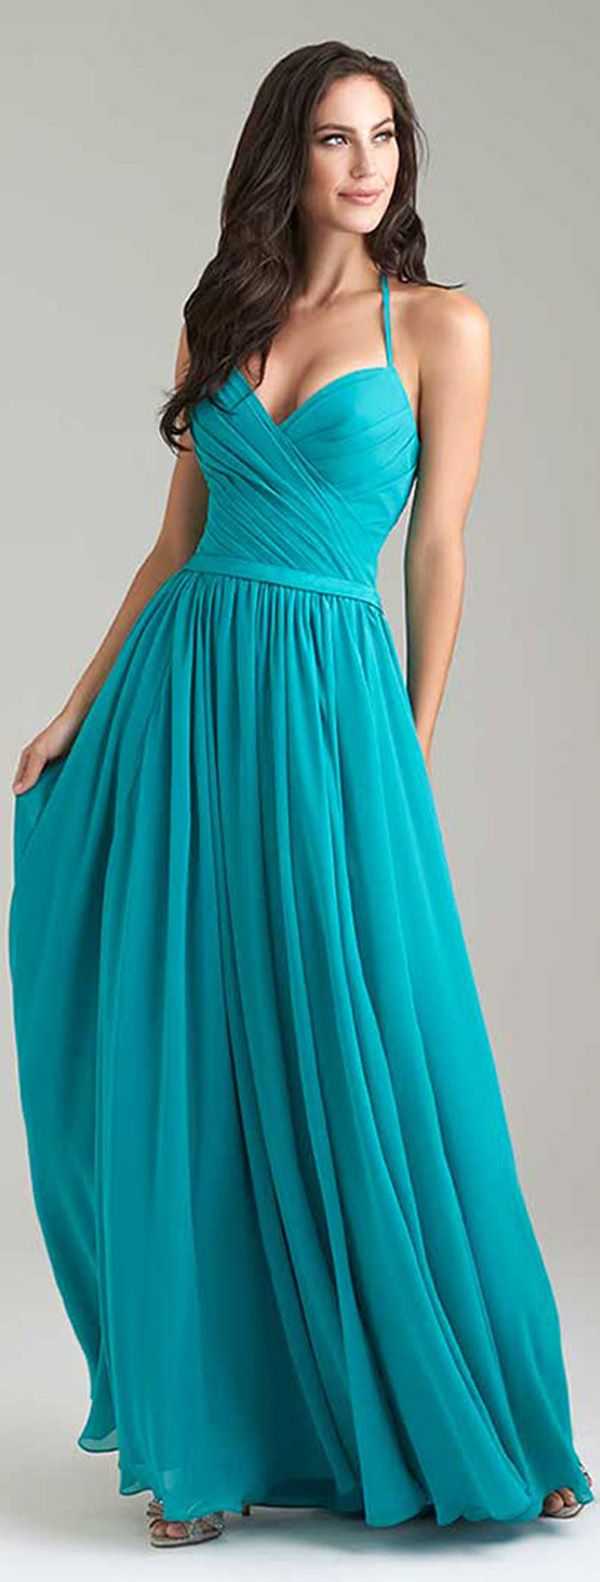 1189 best bridesmaid dresses images on pinterest mermaid stunning chiffon halter neckline a line bridesmaid dresses with belt ombrellifo Gallery